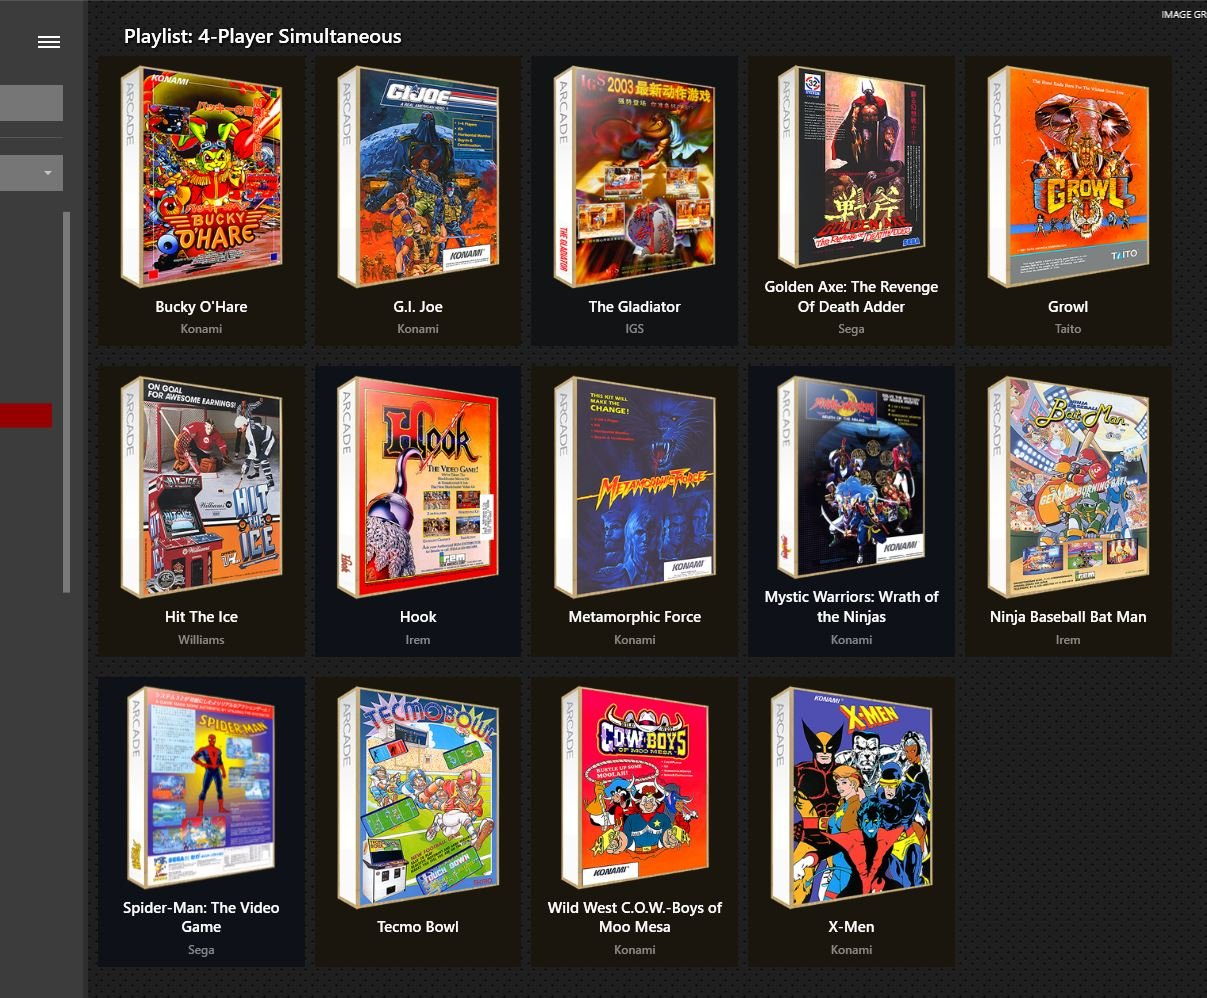 Arcade - 4-Player Simultaneous - Playlists & Playlist Media